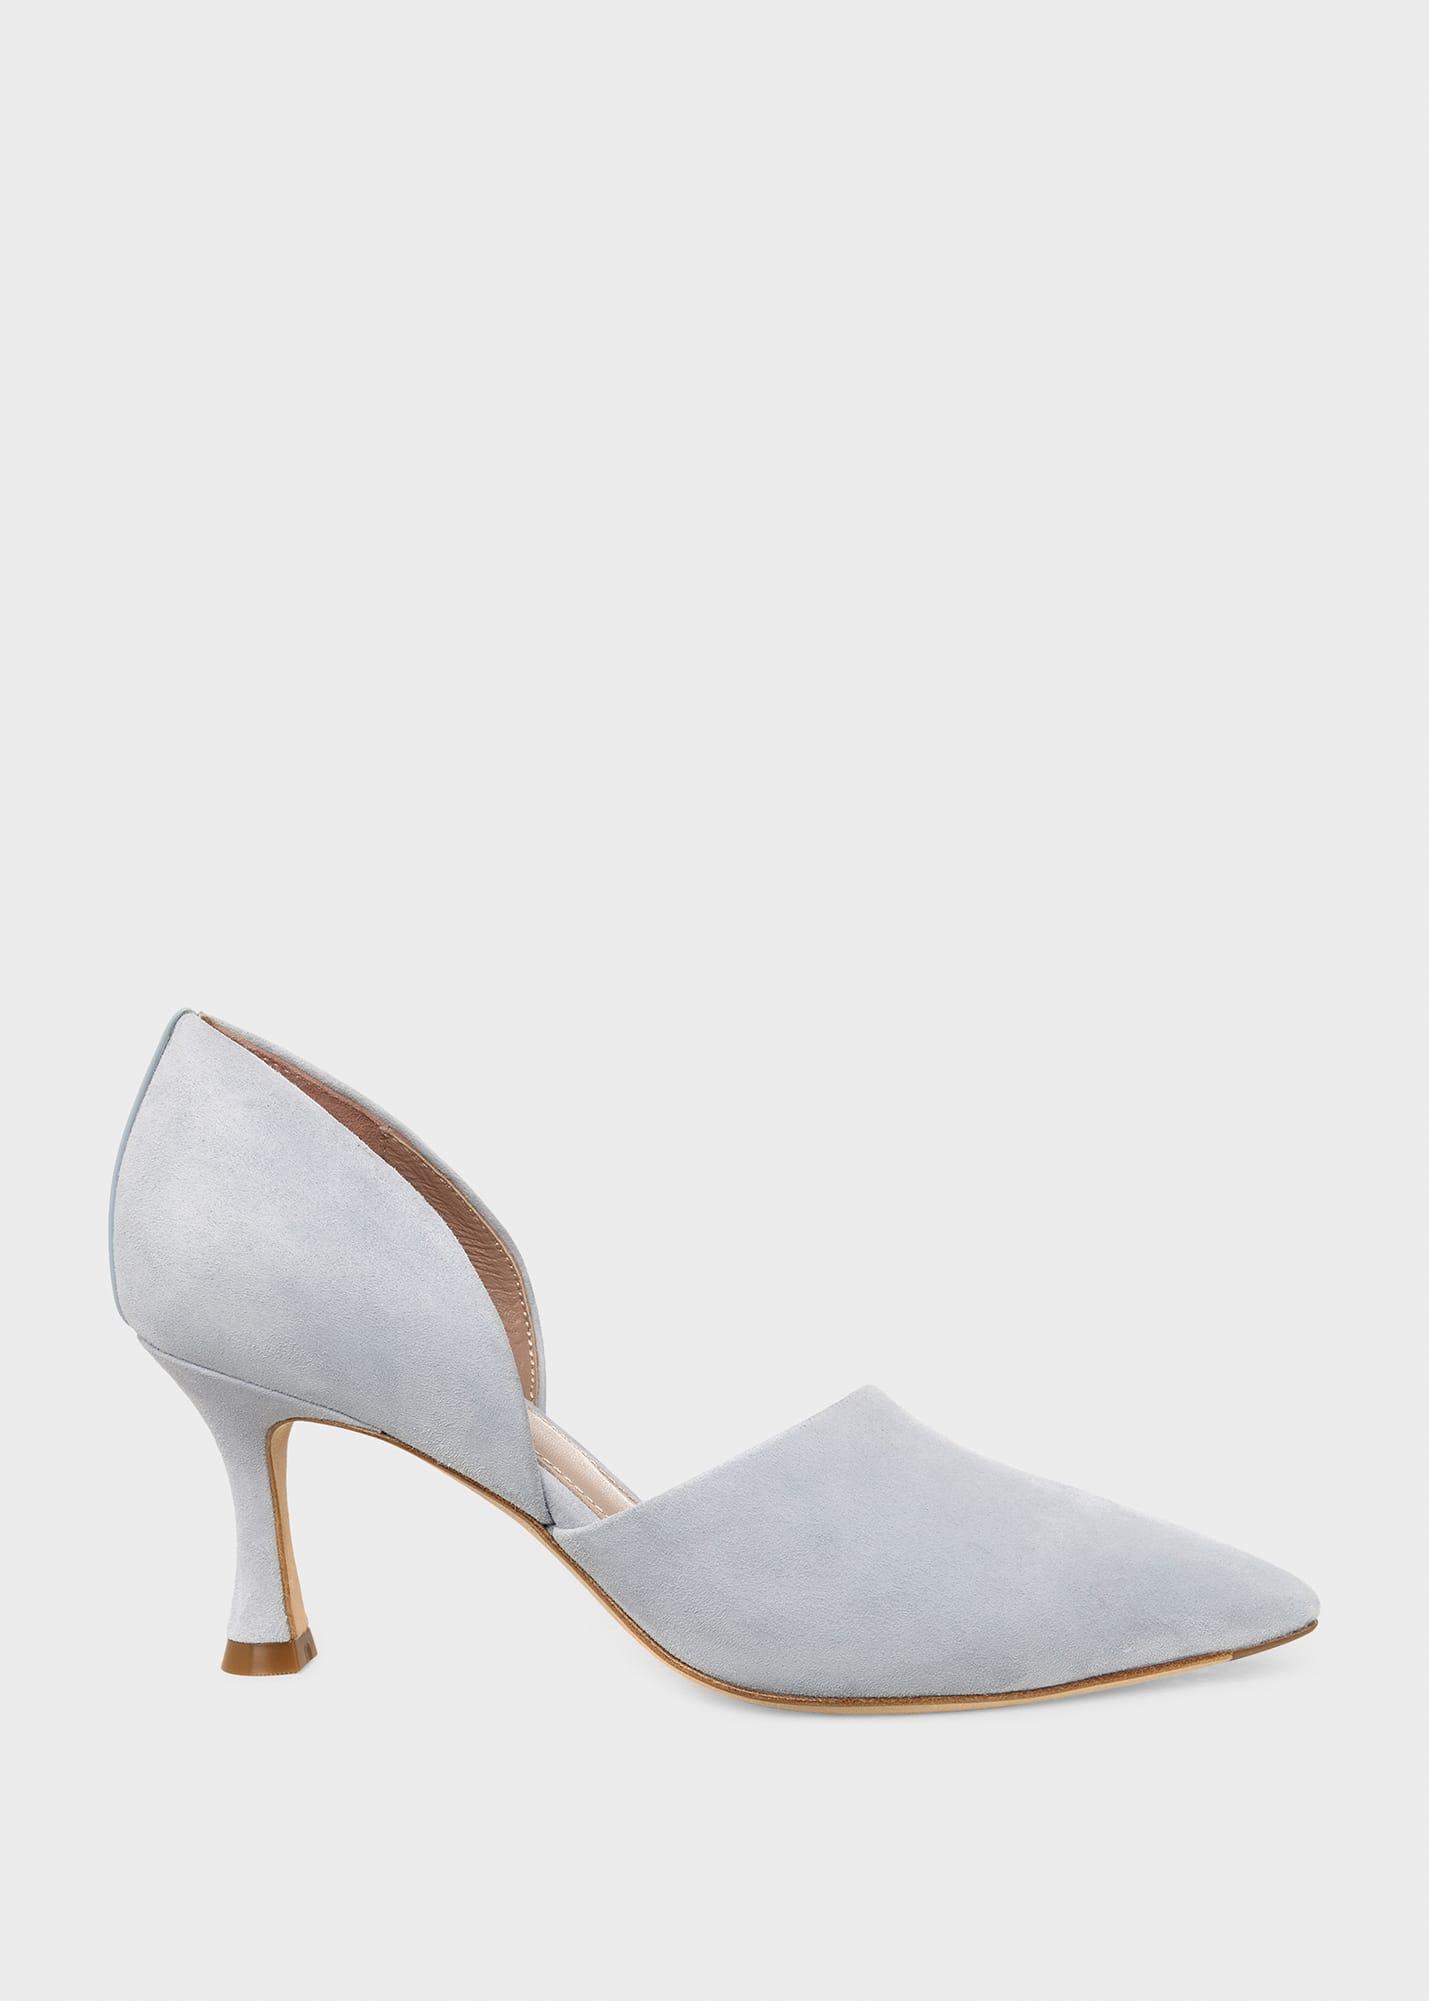 Hobbs Women Maya Suede Stiletto D'Orsay Court Shoes